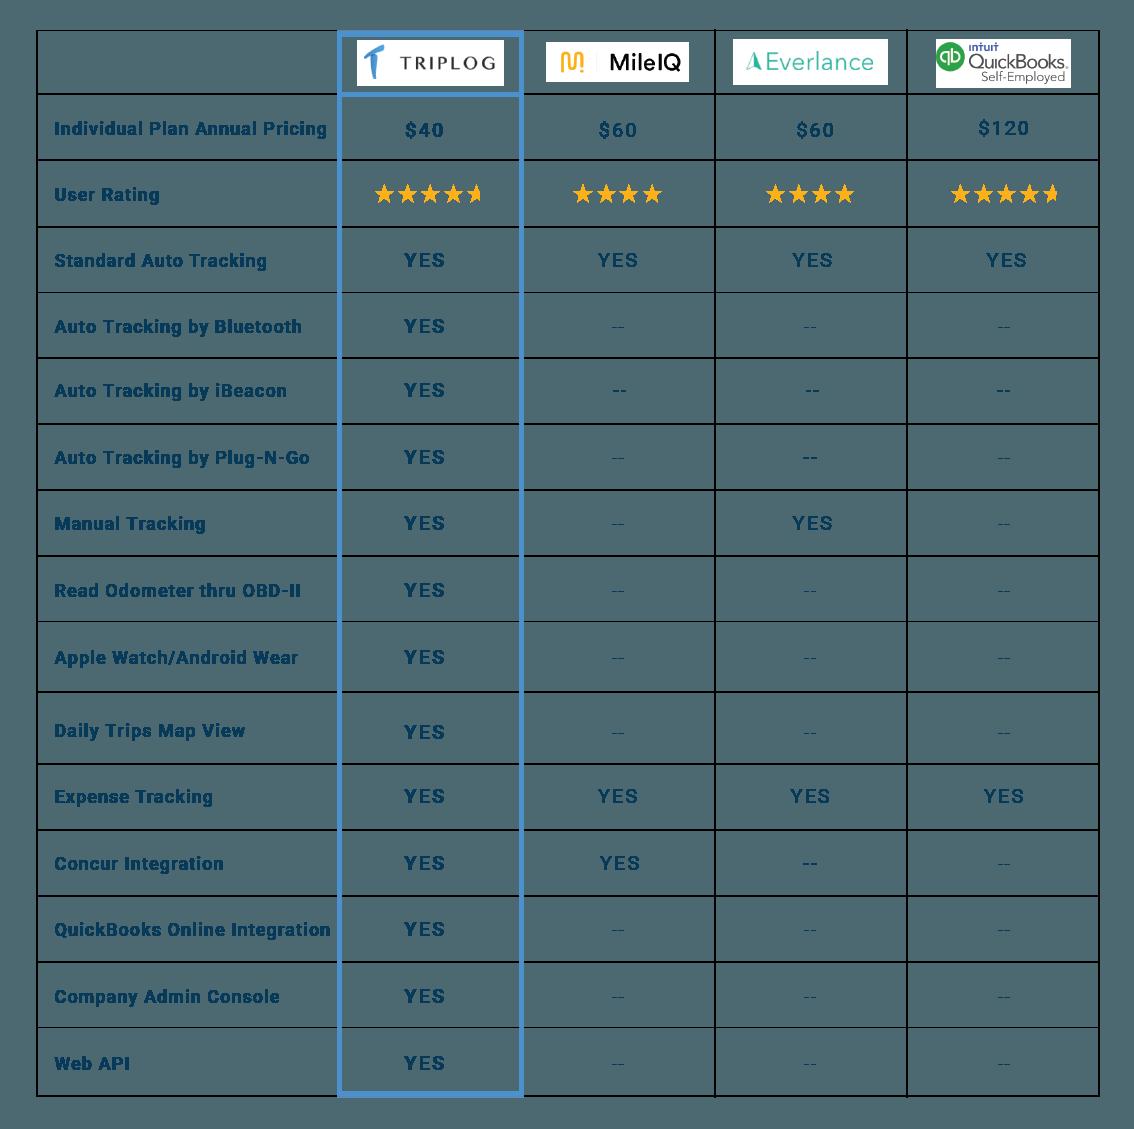 TripLog comparison chart